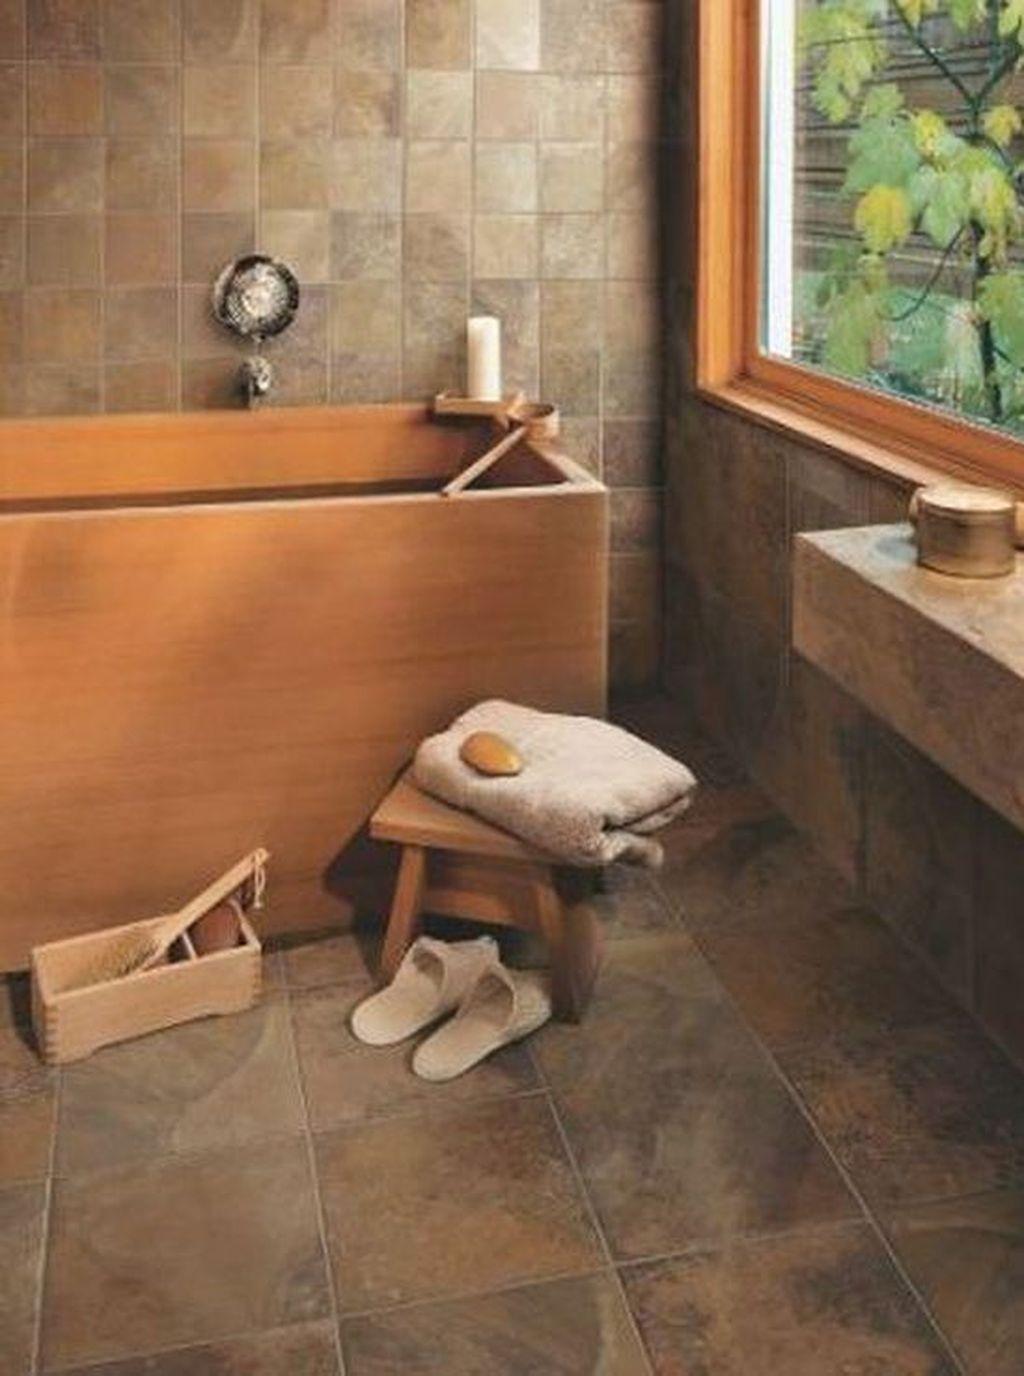 Marvelous Wooden Shower Floor Tiles Designs Ideas For Bathroom Remodel 15